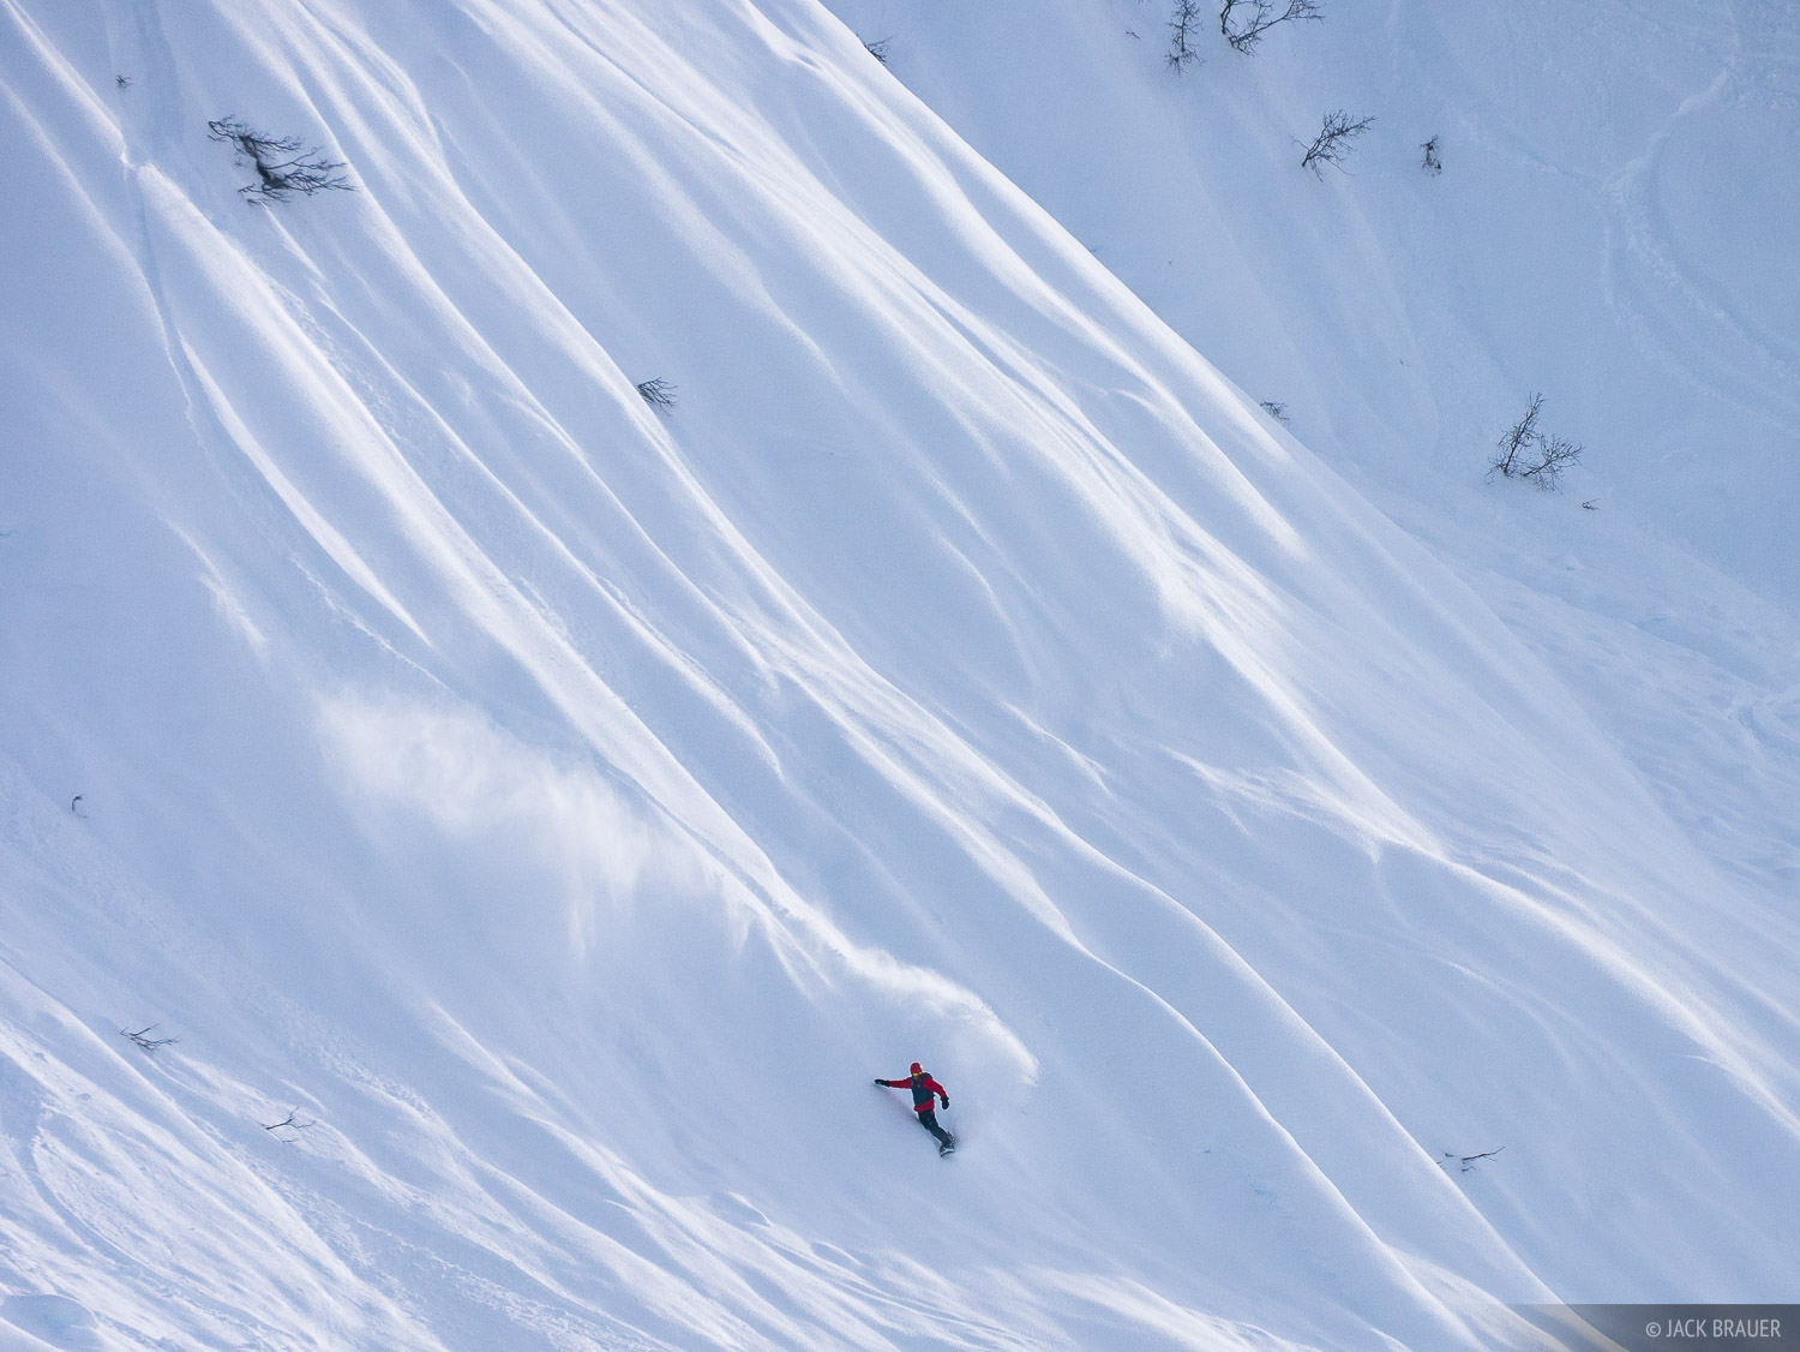 Snowboarder: Mikel Goicoechea.